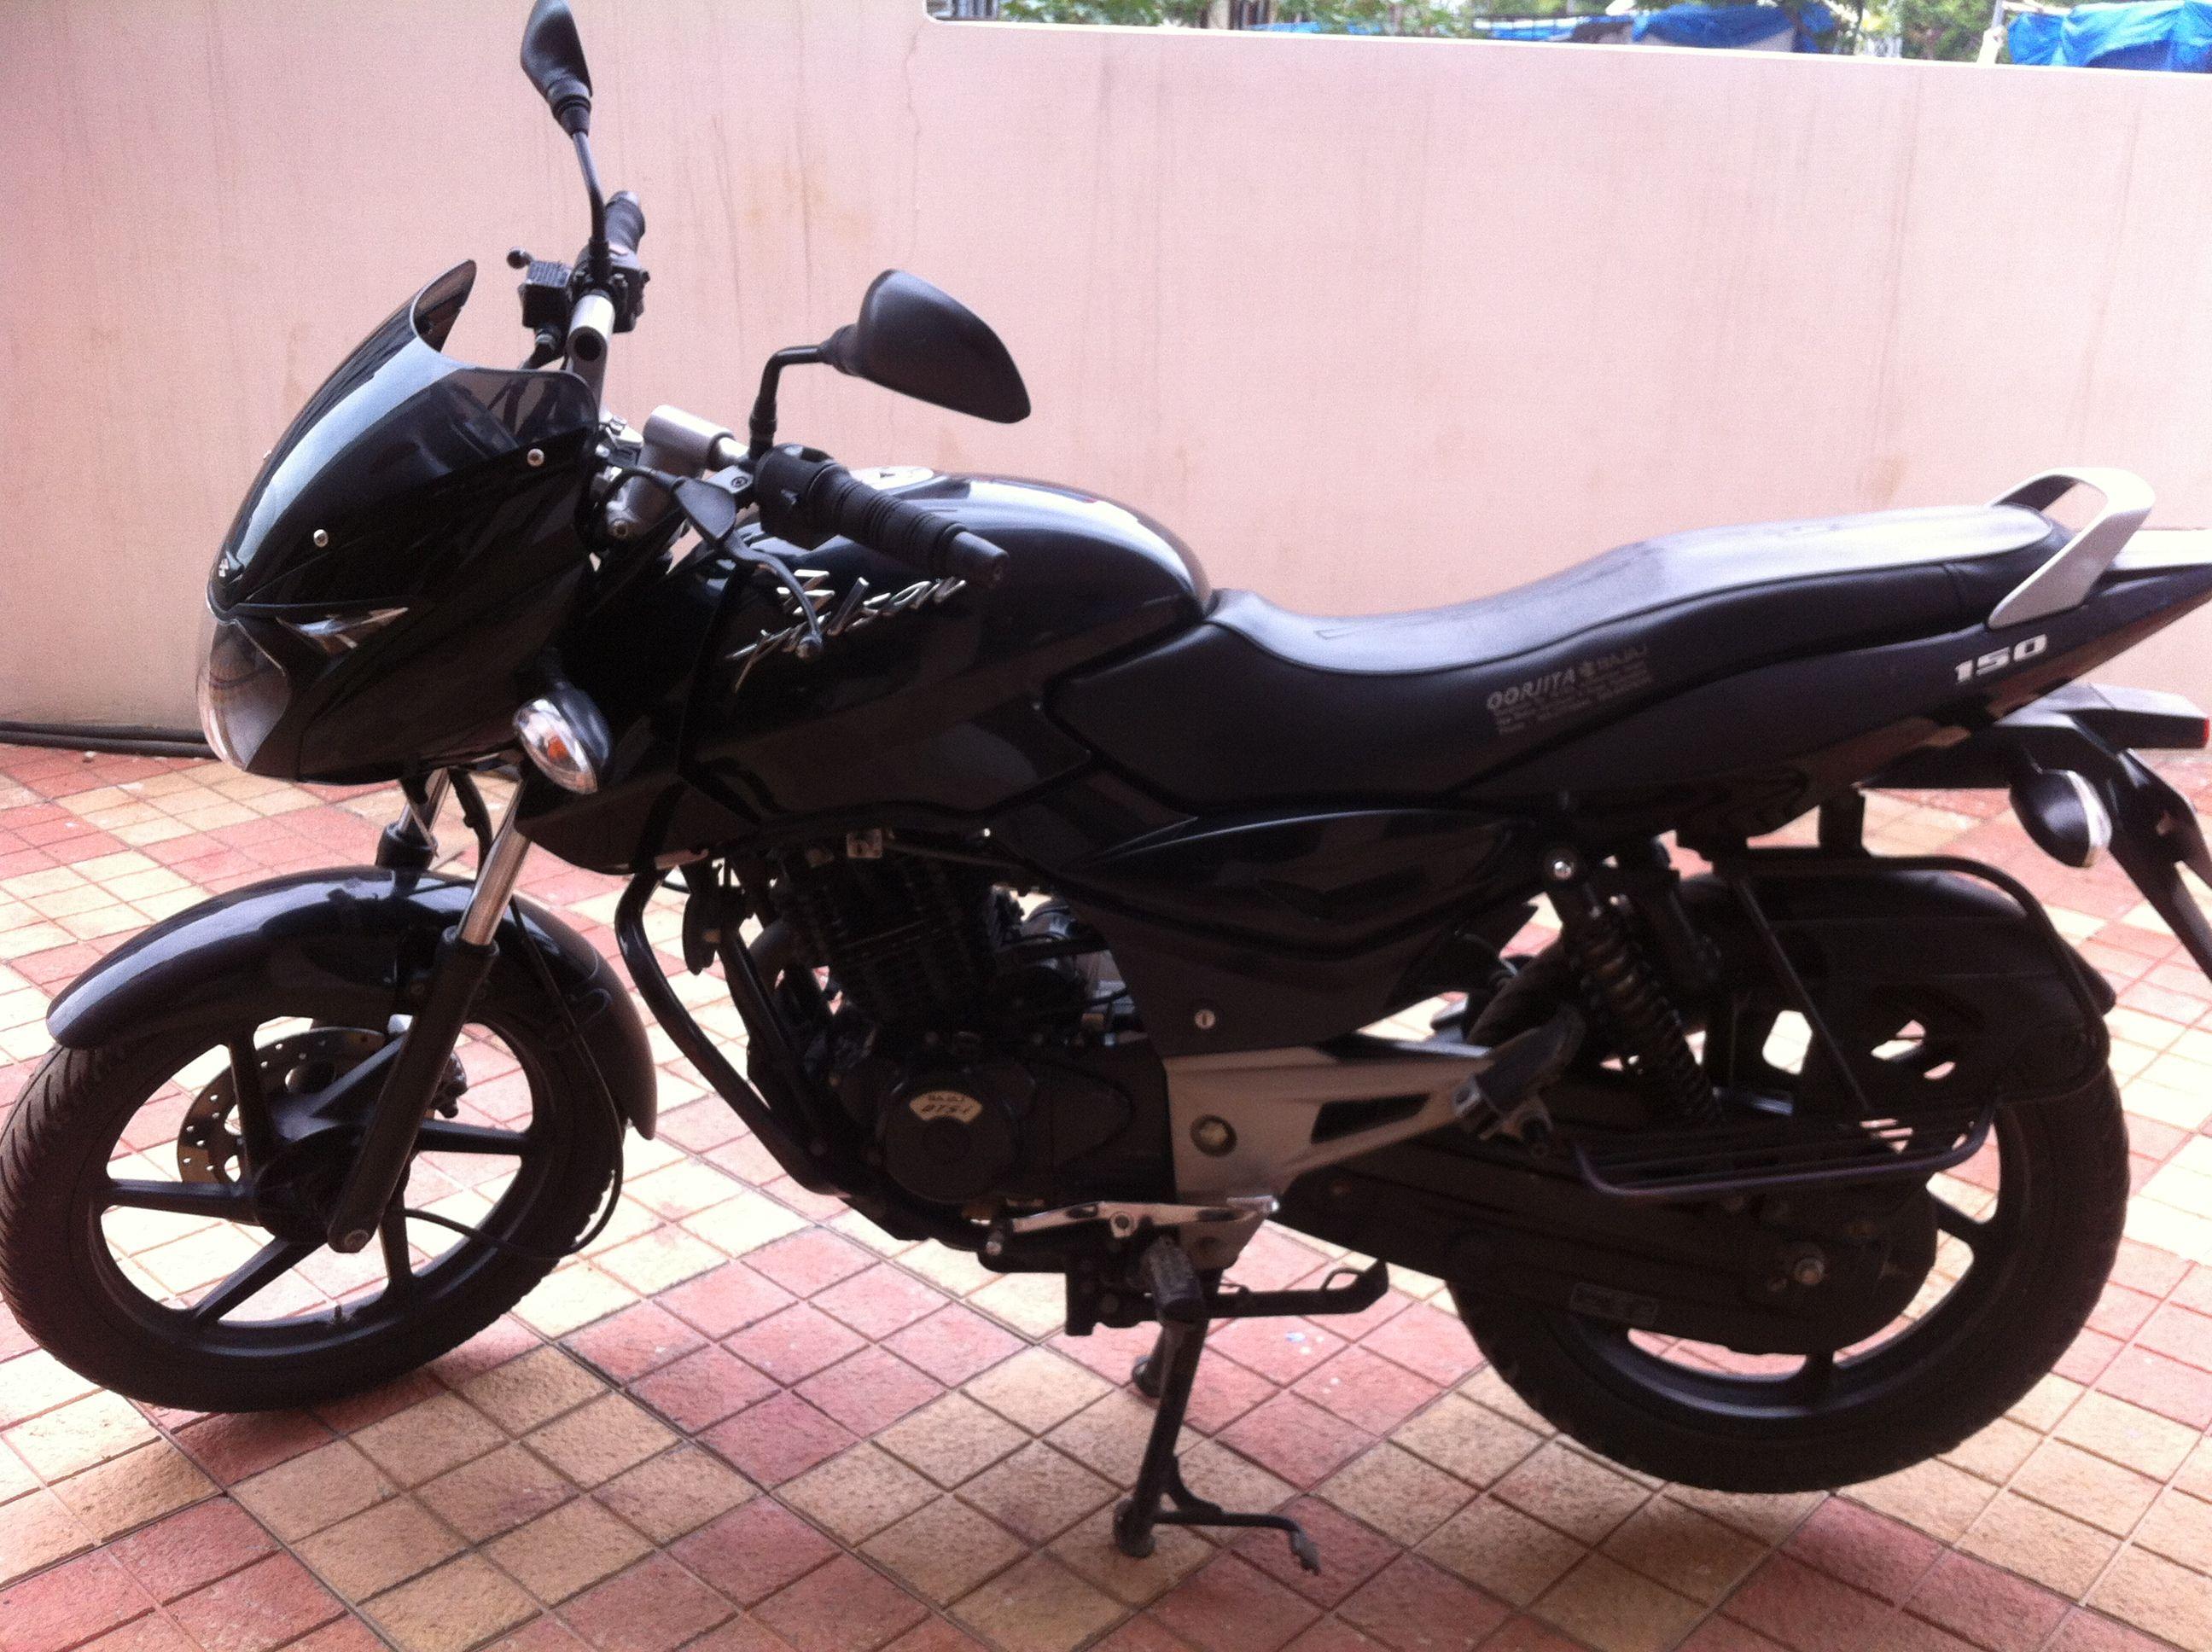 Bajaj Pulsar Is For Sale In Hyderabad More Details On The